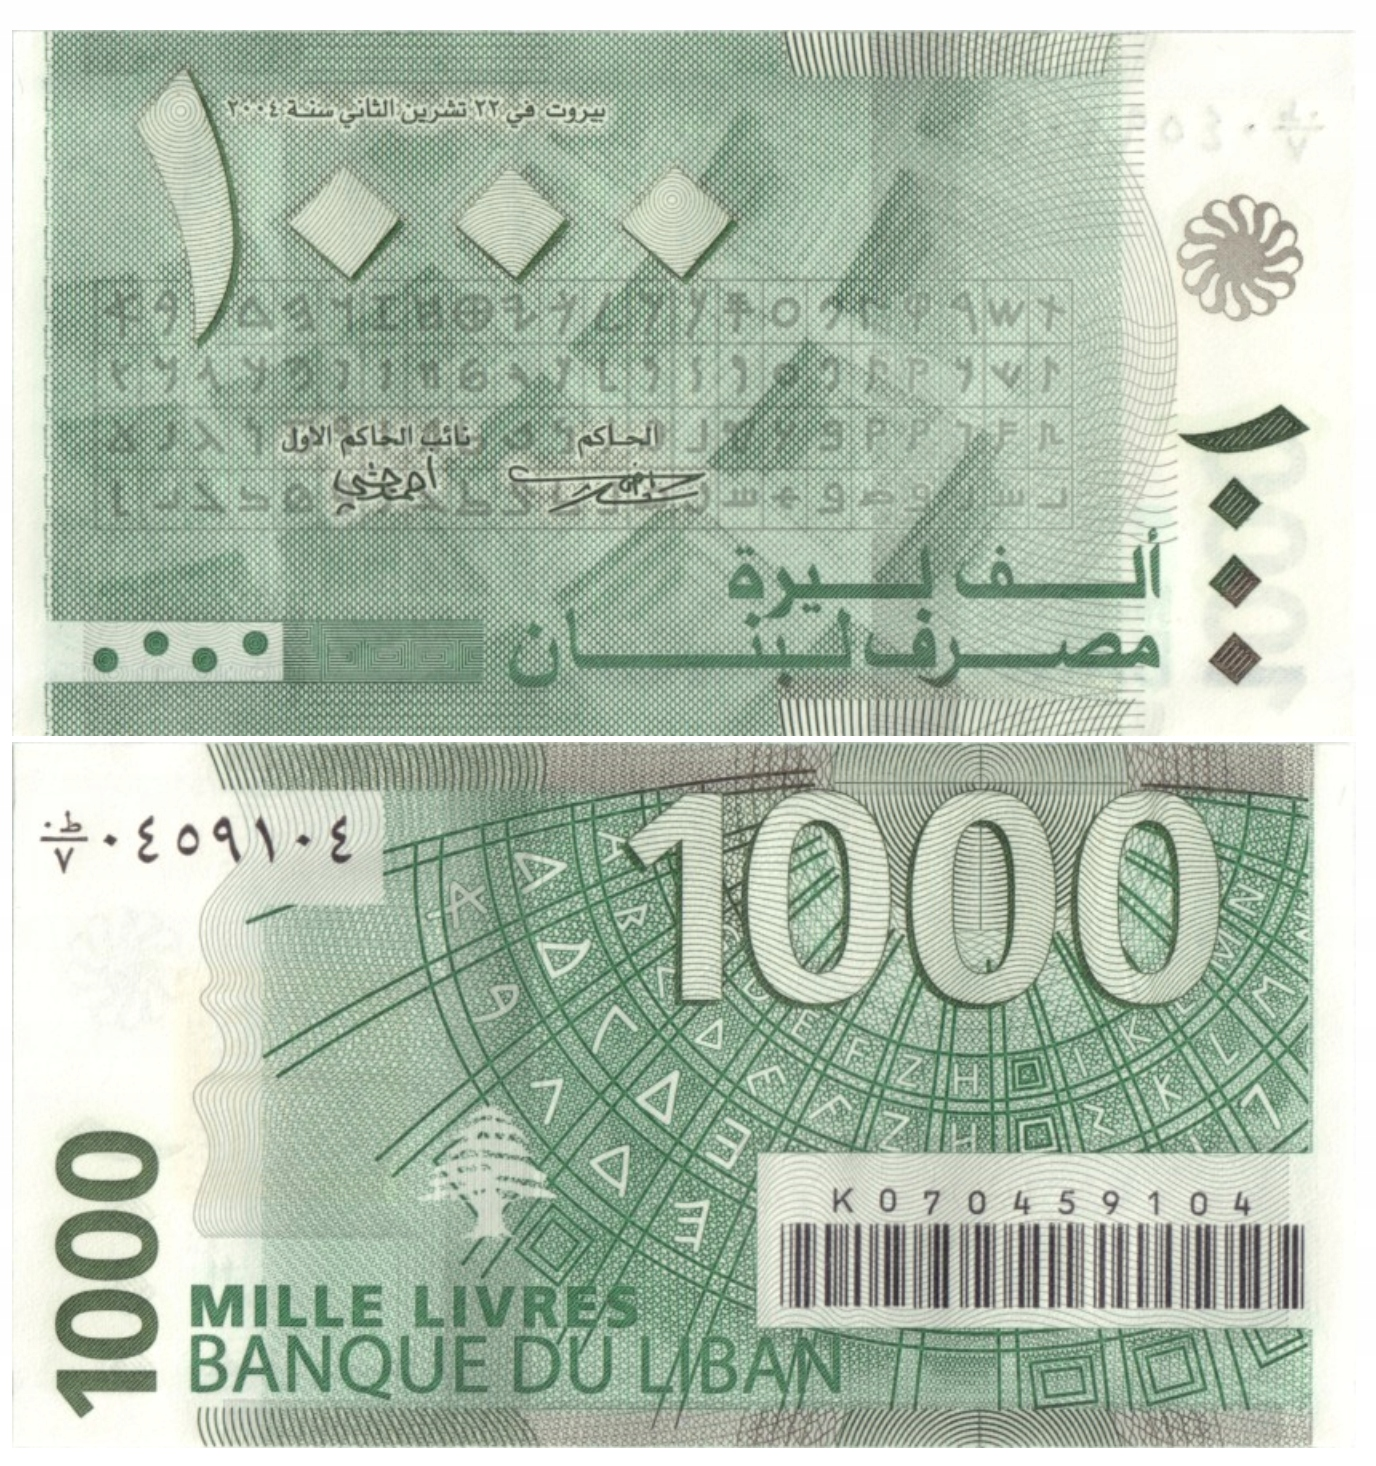 LIBANON 1000 LIVRES 2004 P-84a UNC